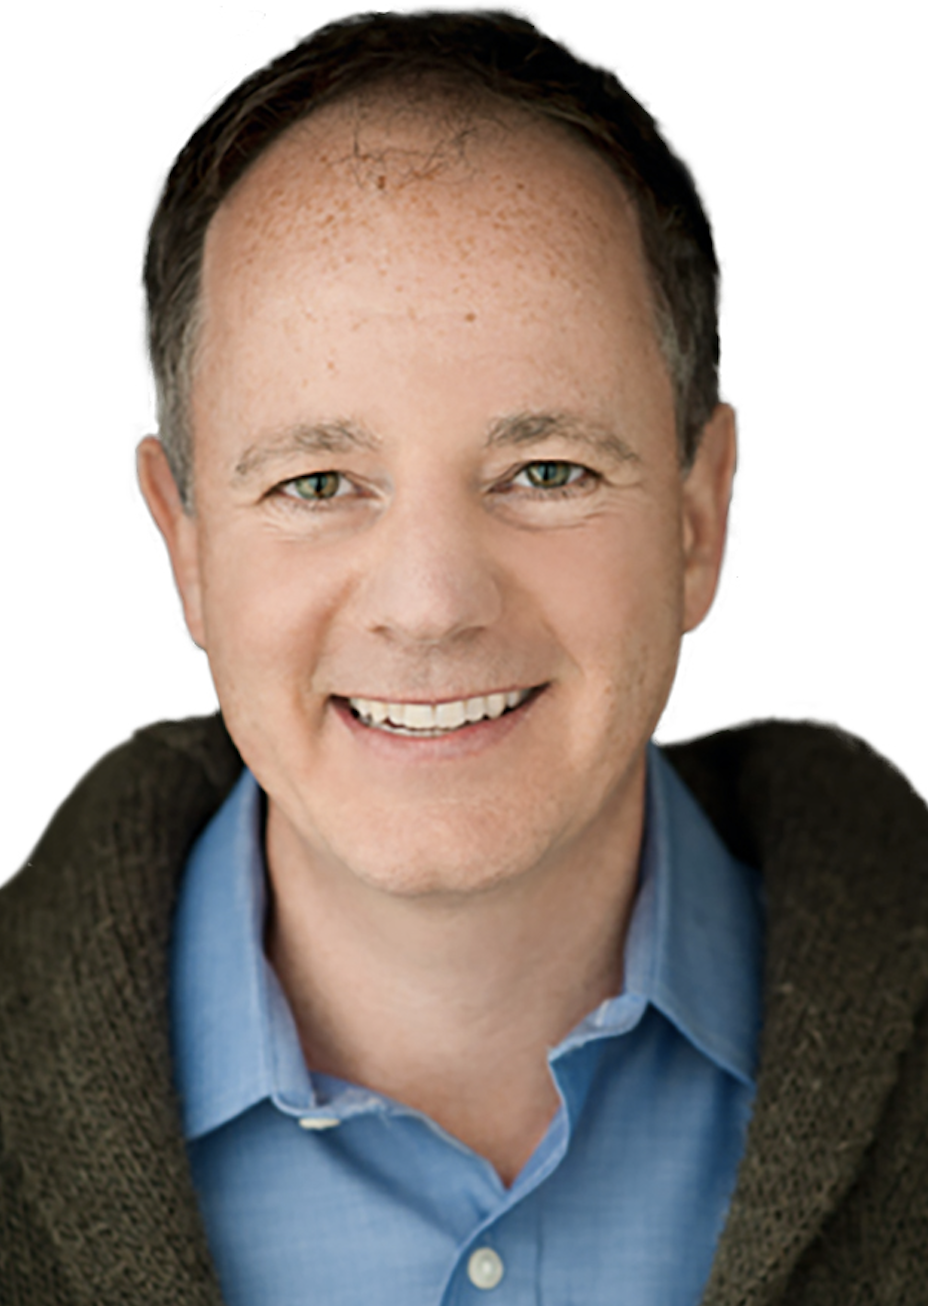 Paul Griggs (CBT Therapist)